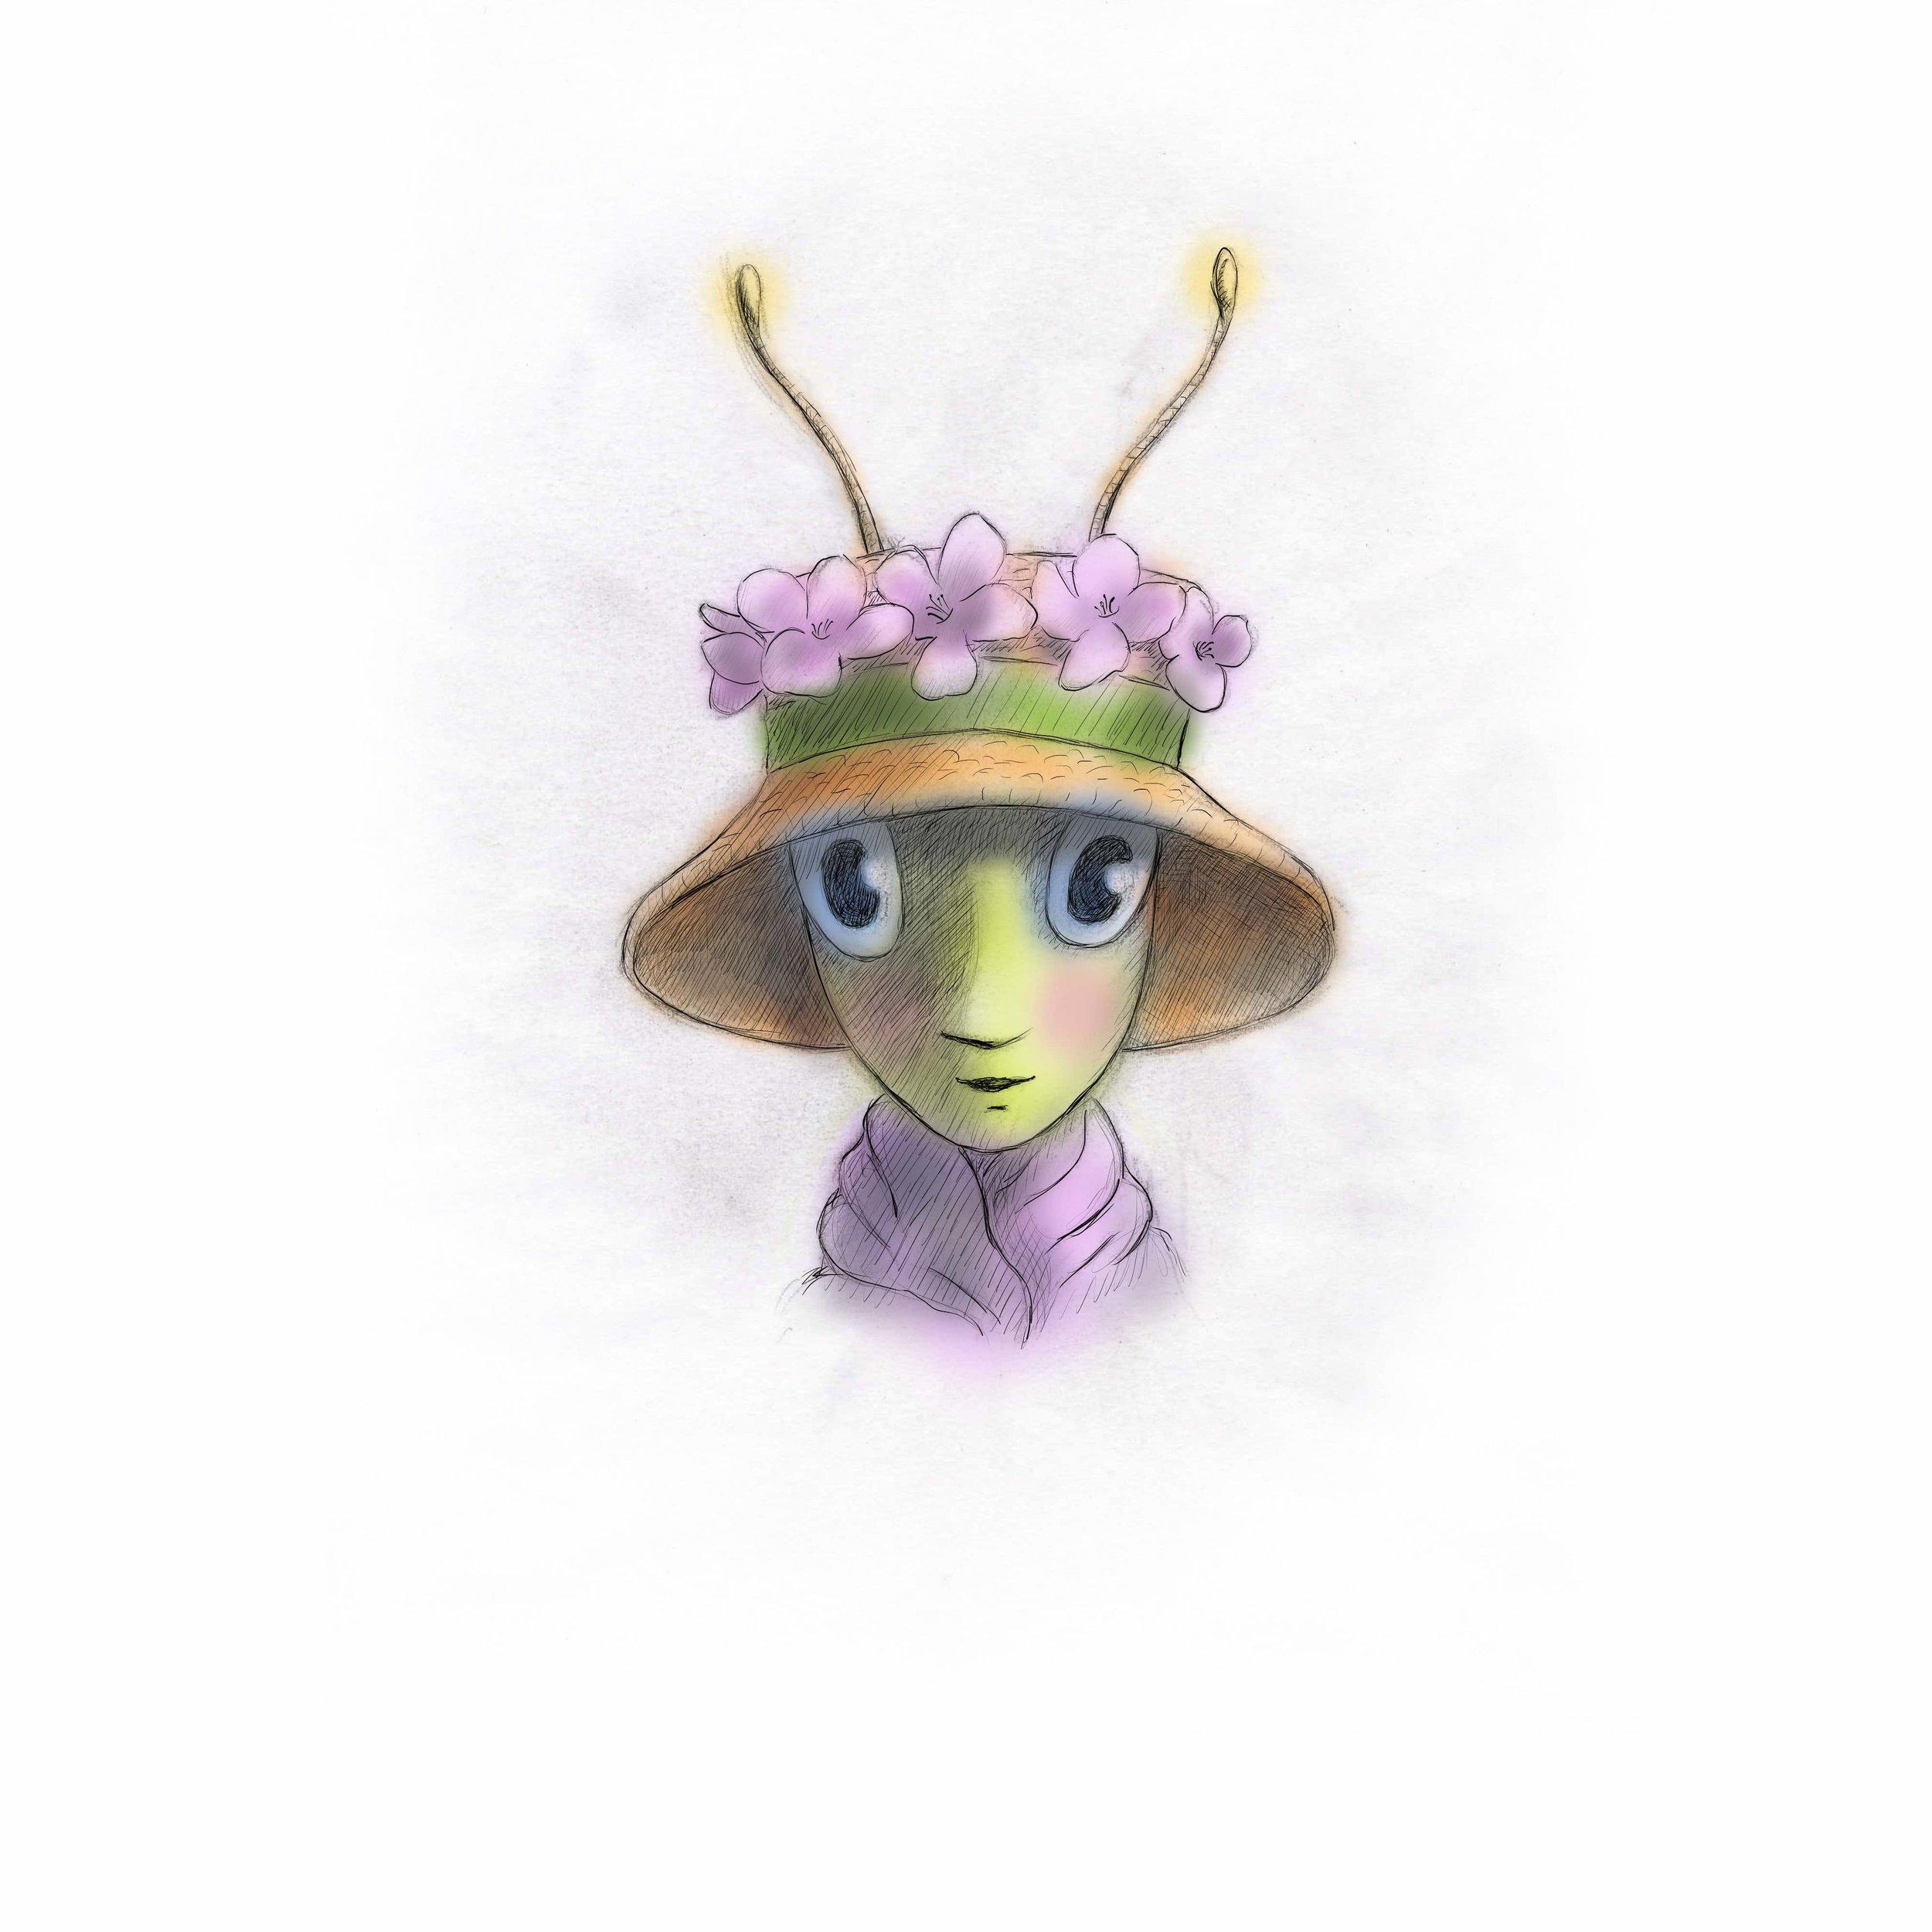 fashion bug with hat 3.jpeg